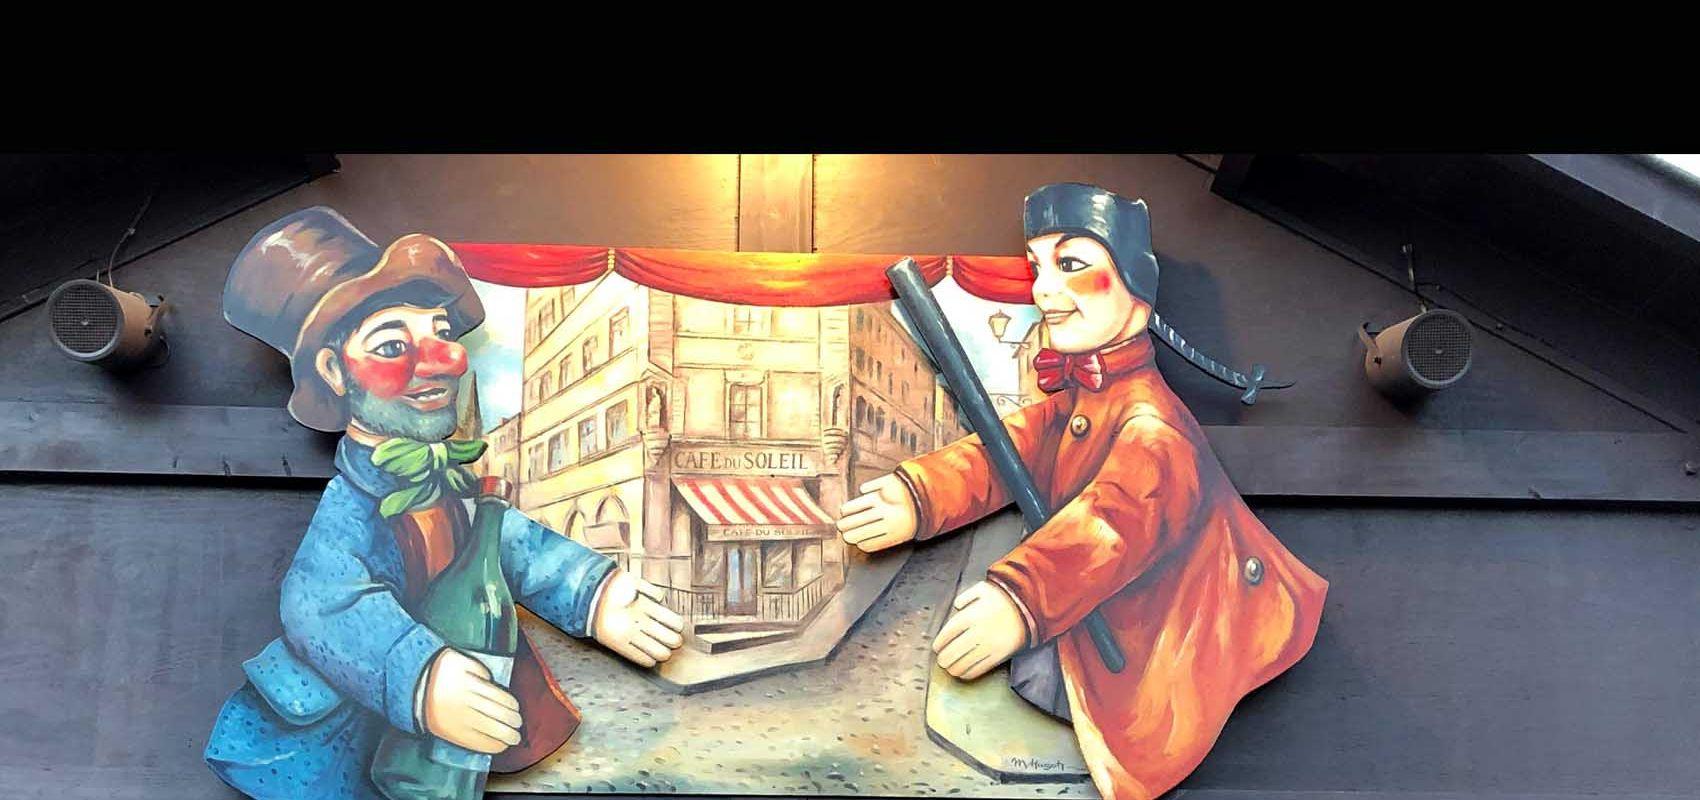 made in gone - Historique de Guignol